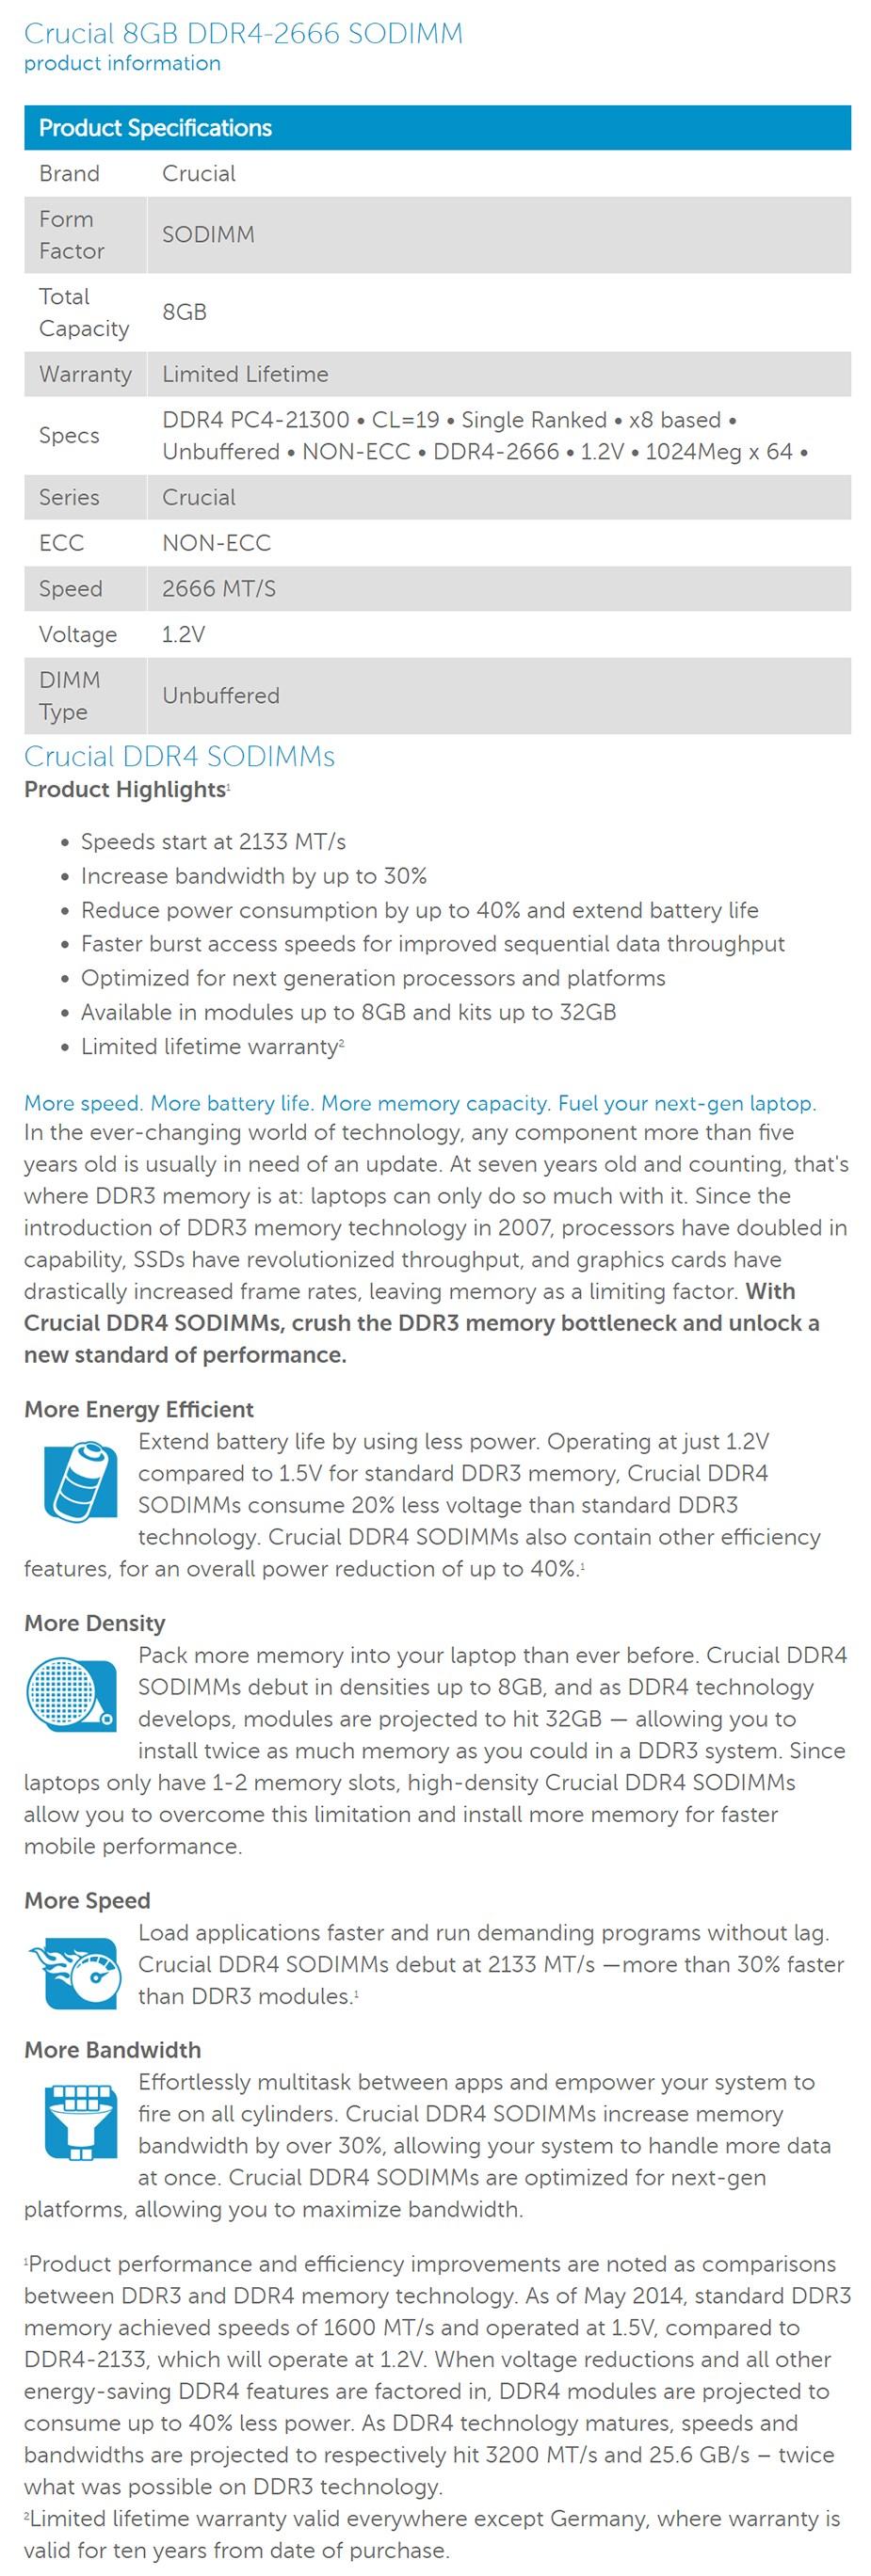 Crucial 8GB (1x 8GB) DDR4-2666 SODIMM Non-ECC Memory - Desktop Overview 1